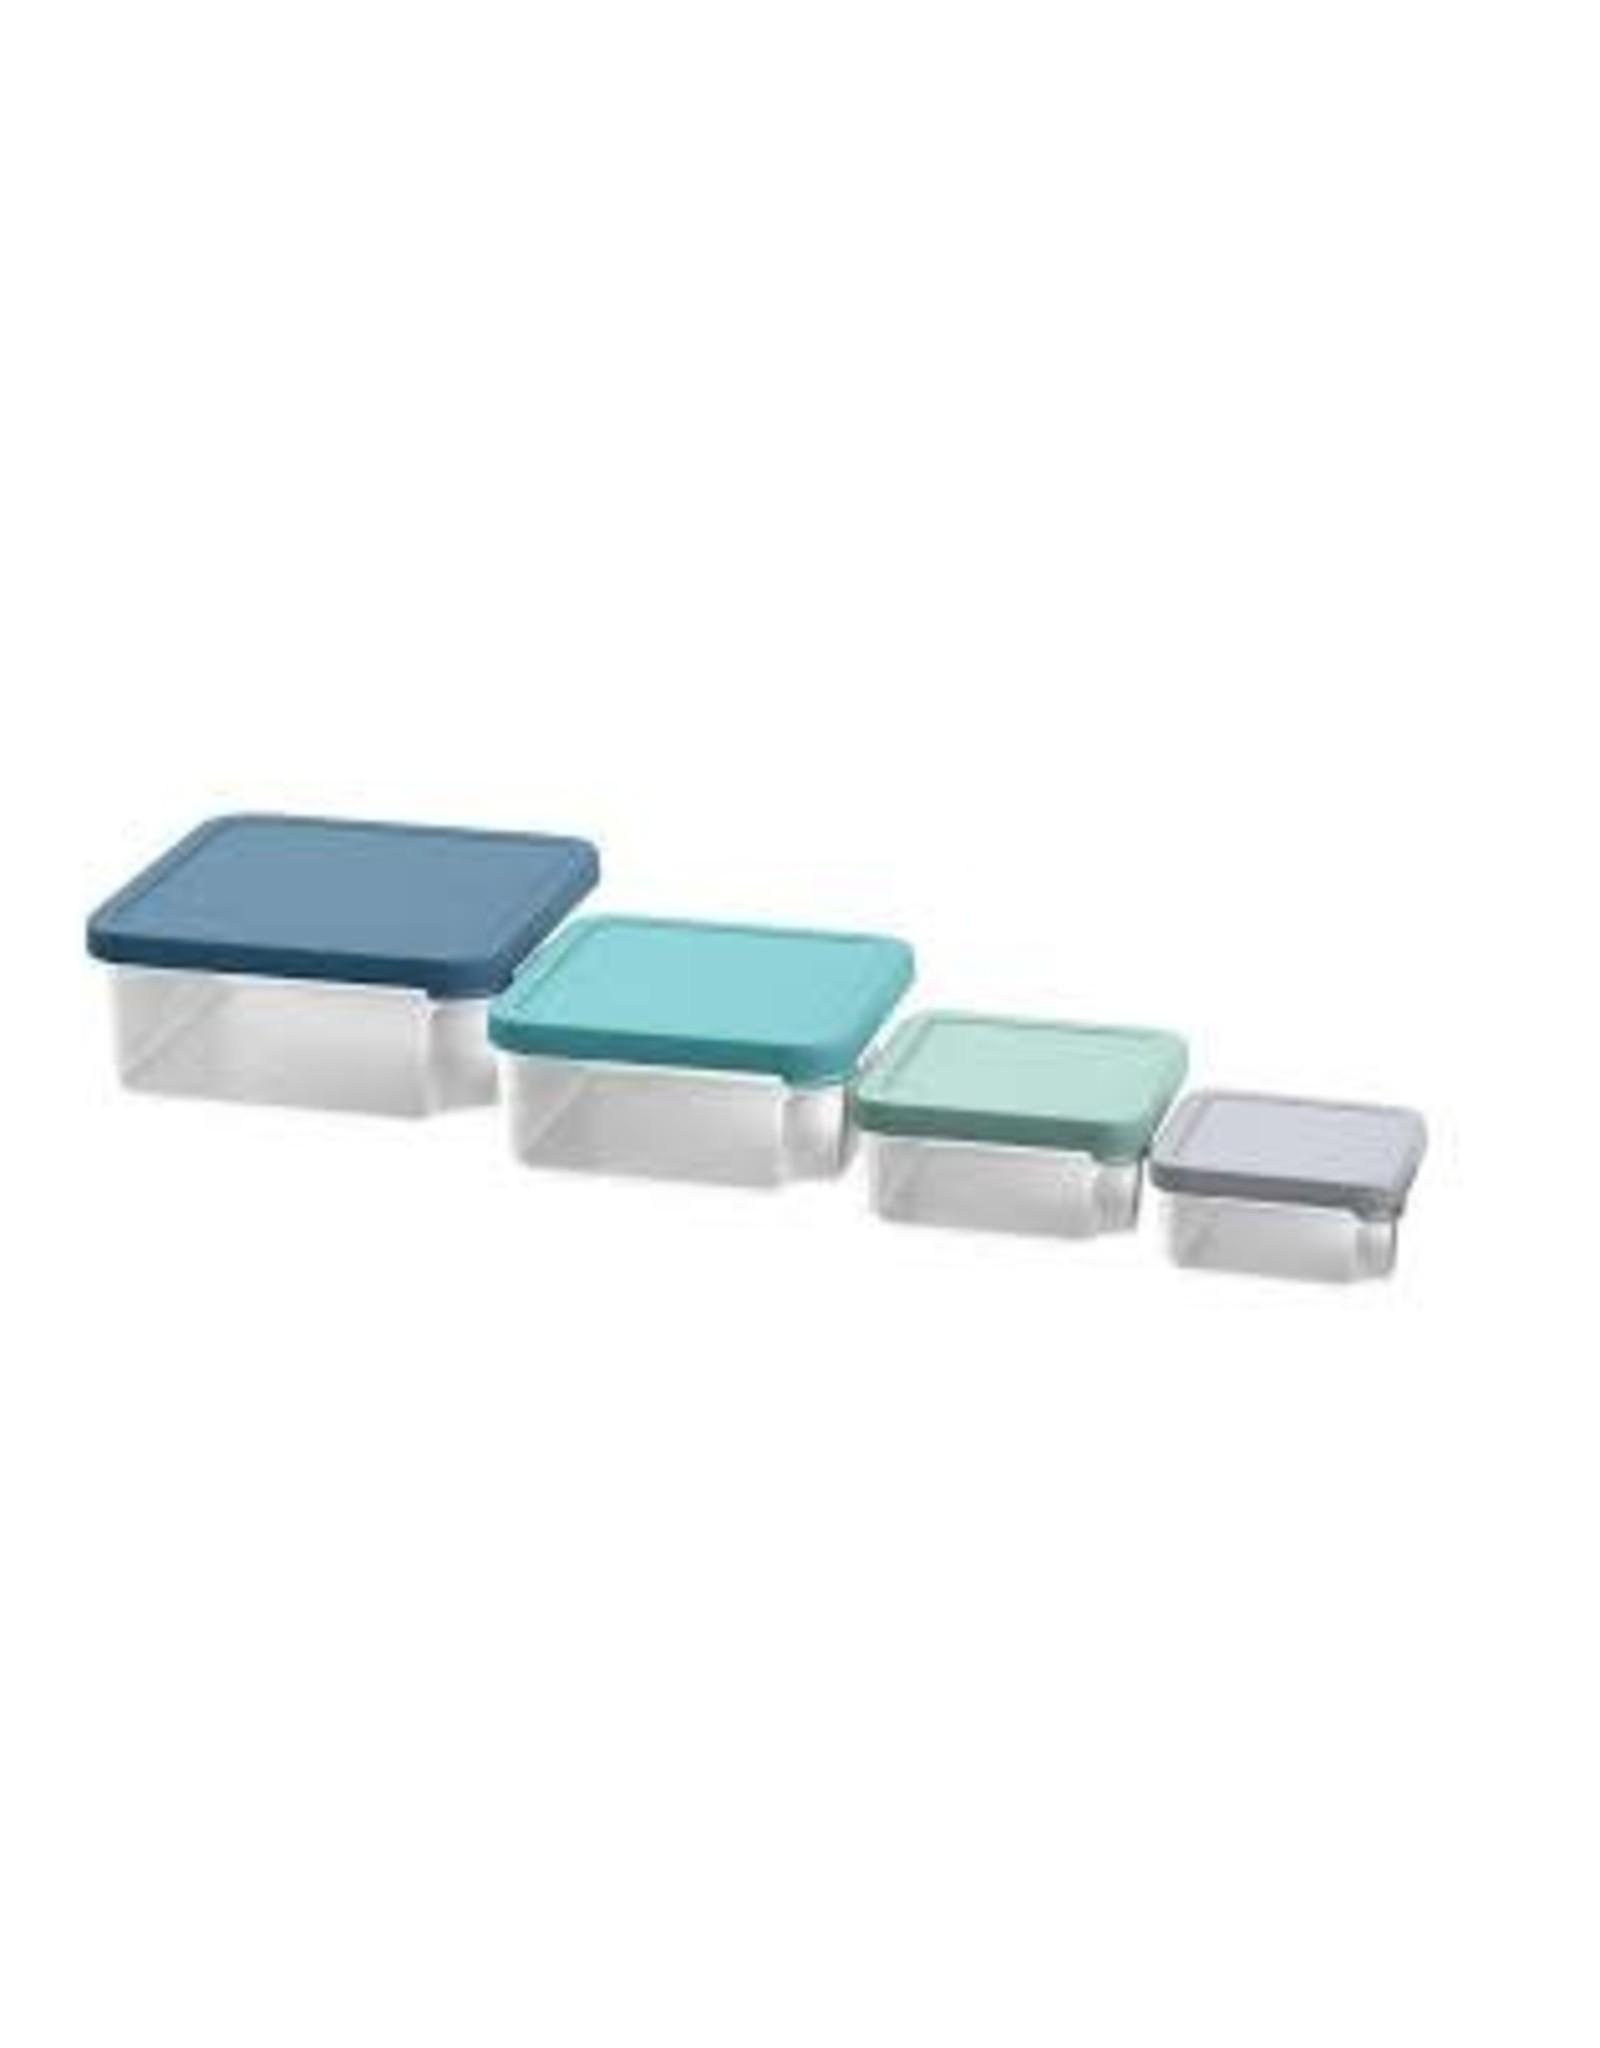 TarHong TarHong- Frame S/4 Storage Containers,  14 oz., 31 oz., 66.5 oz.,115 oz.